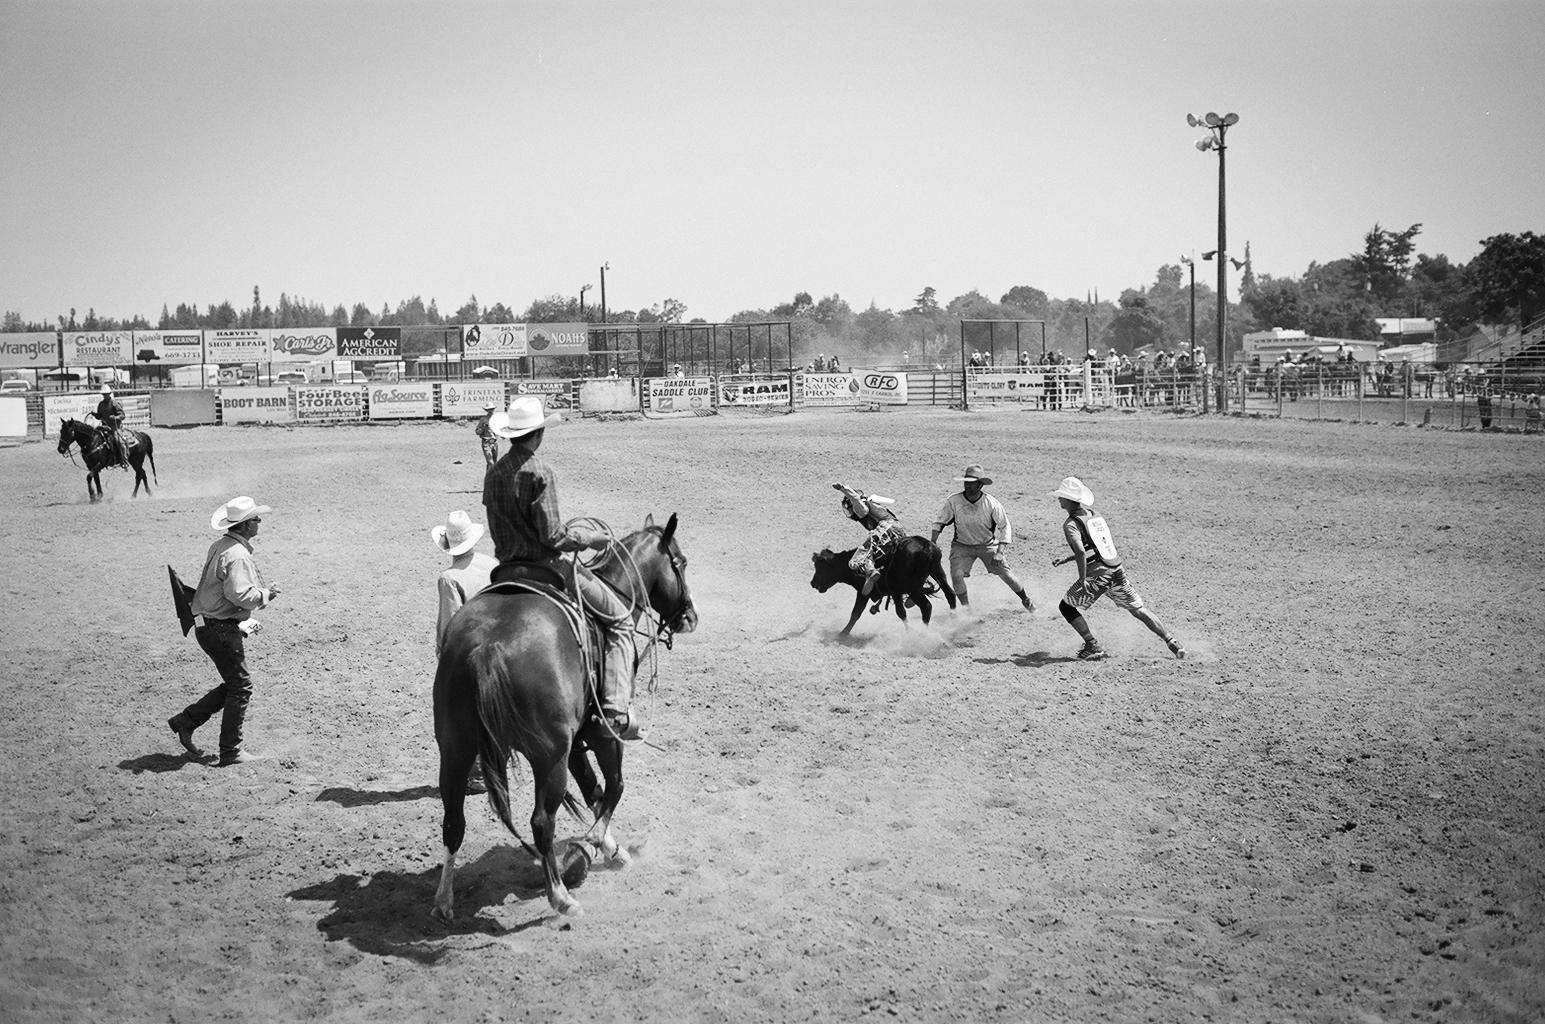 rodeo8.jpg